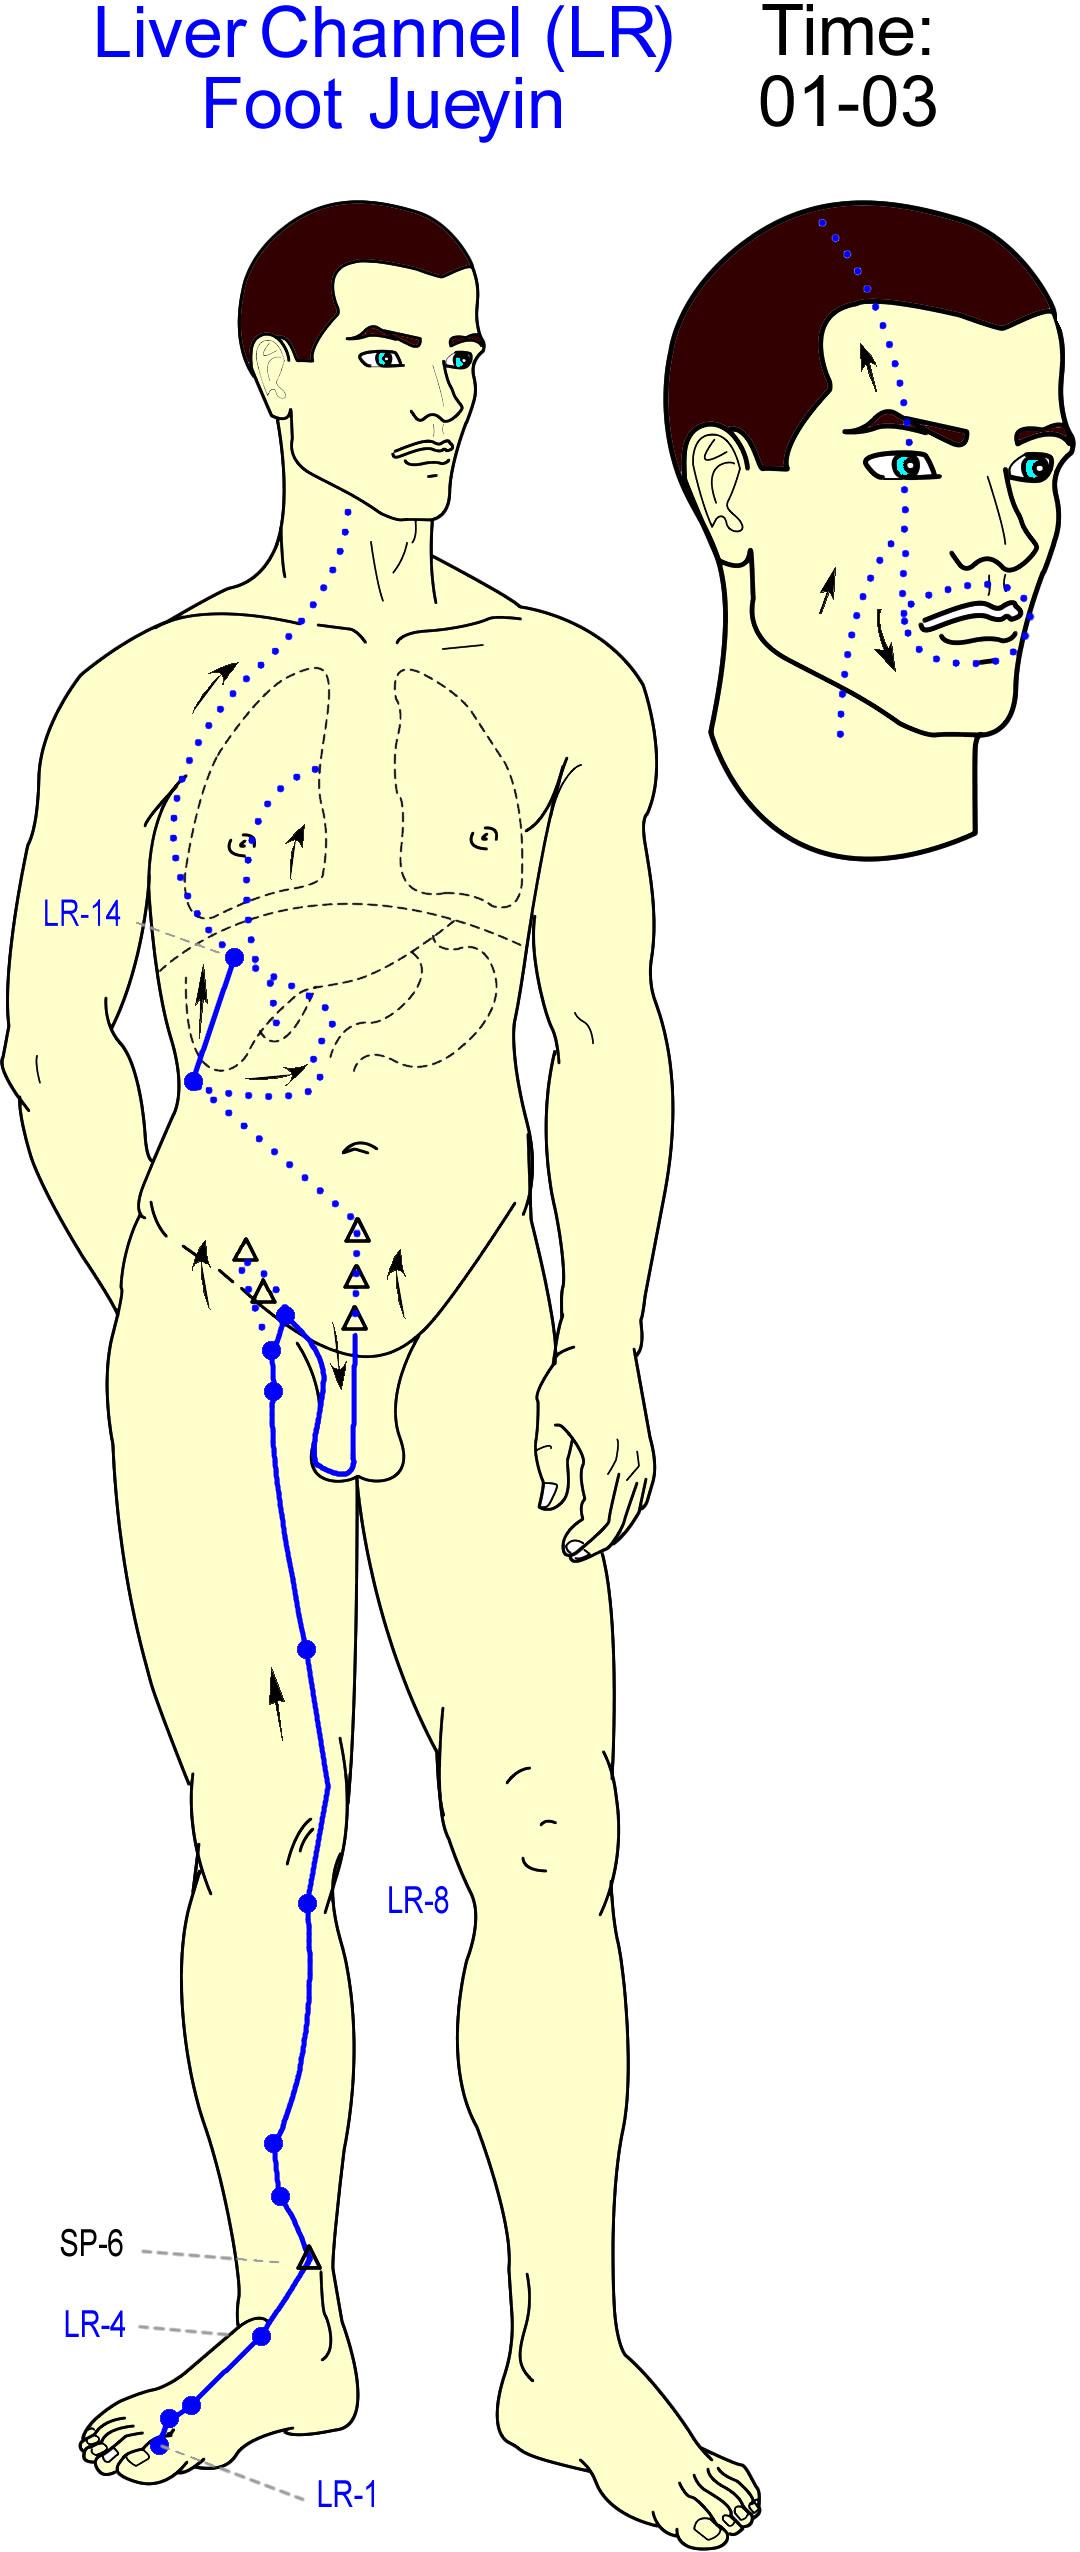 meridian hati - liver